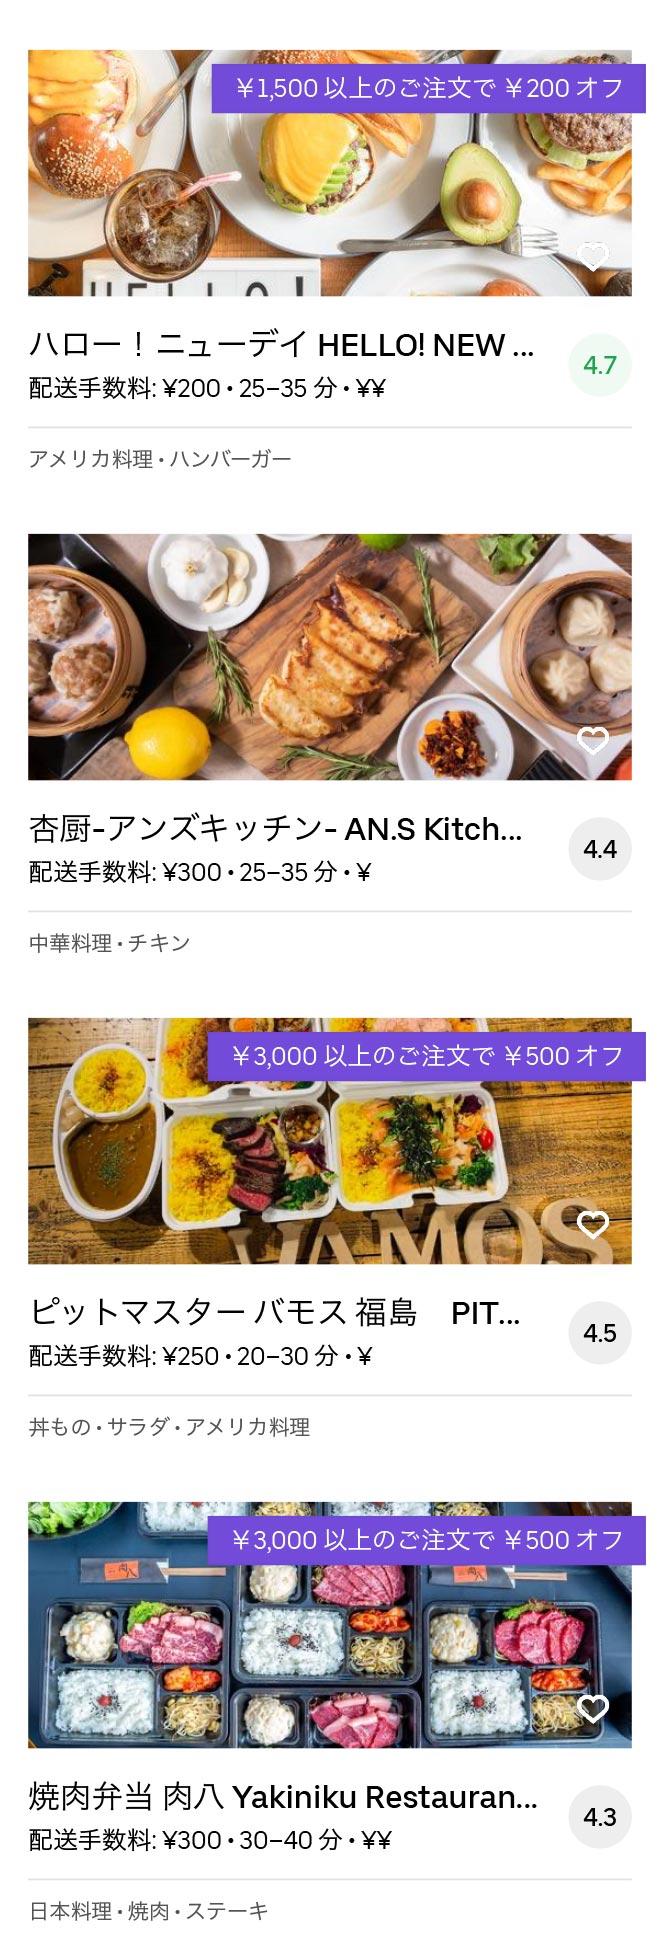 Osaka nishi kujo menu 2005 09